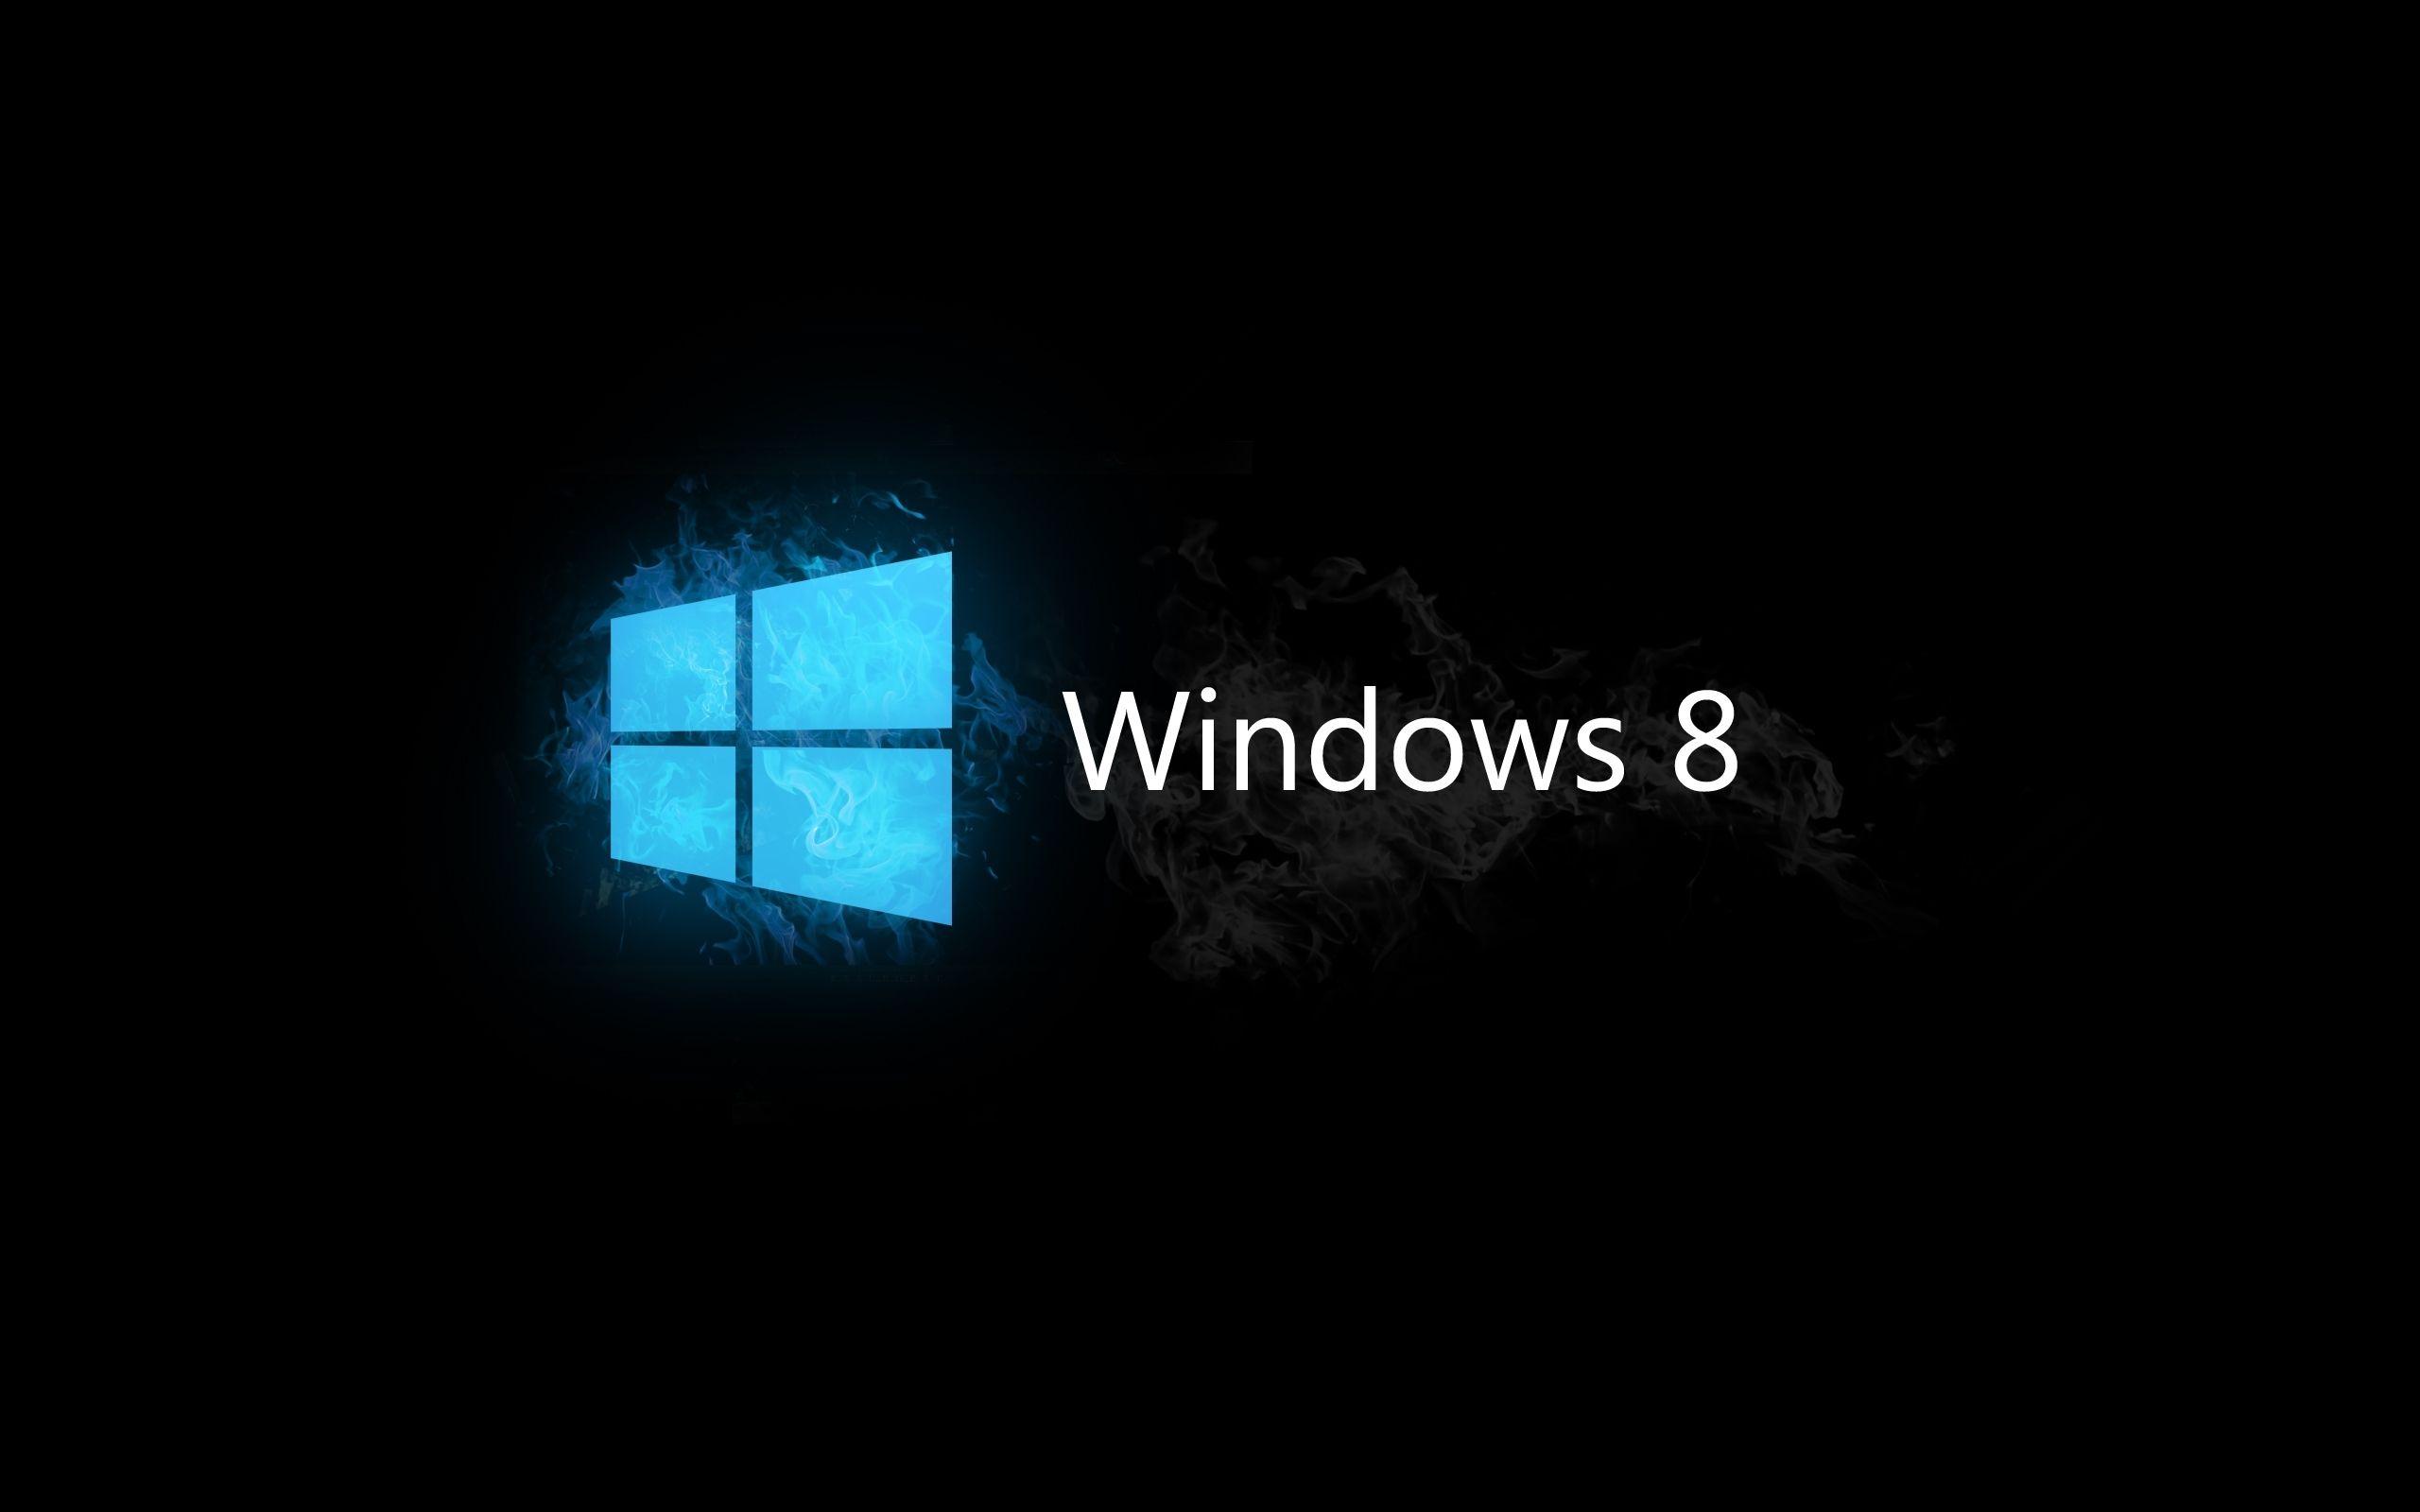 Windows 8 Wallpaper Black Jpg 2560 1600 Windows Wallpaper Hd Wallpaper Desktop Windows 8